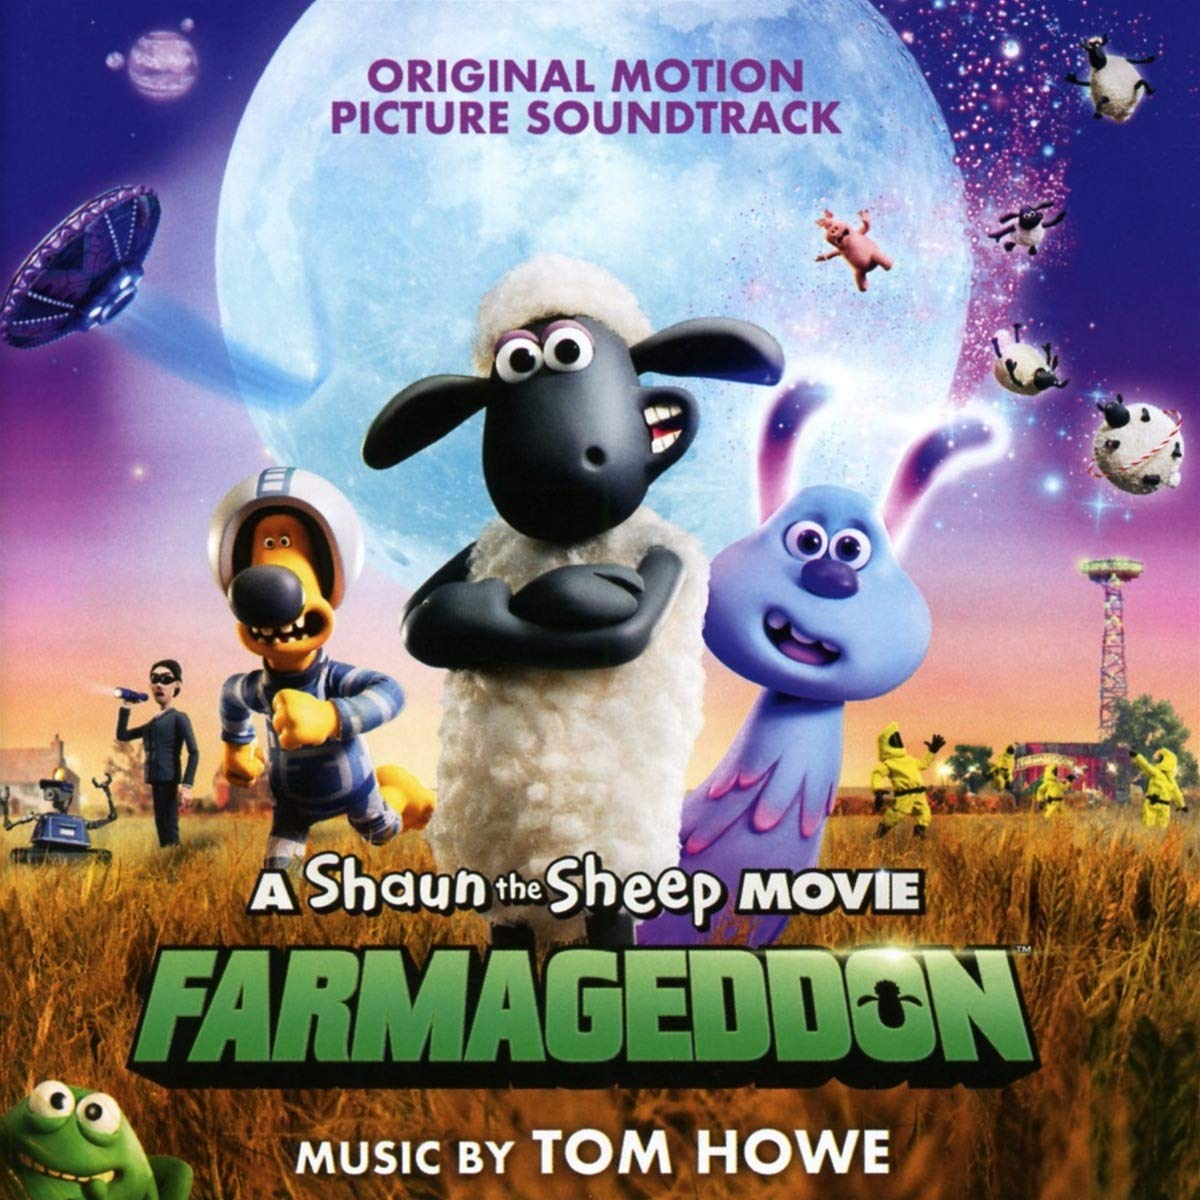 A Shaun The Sheep Movie: Farmageddon (Original Motion Picture Soundtrack) - Tom Howe